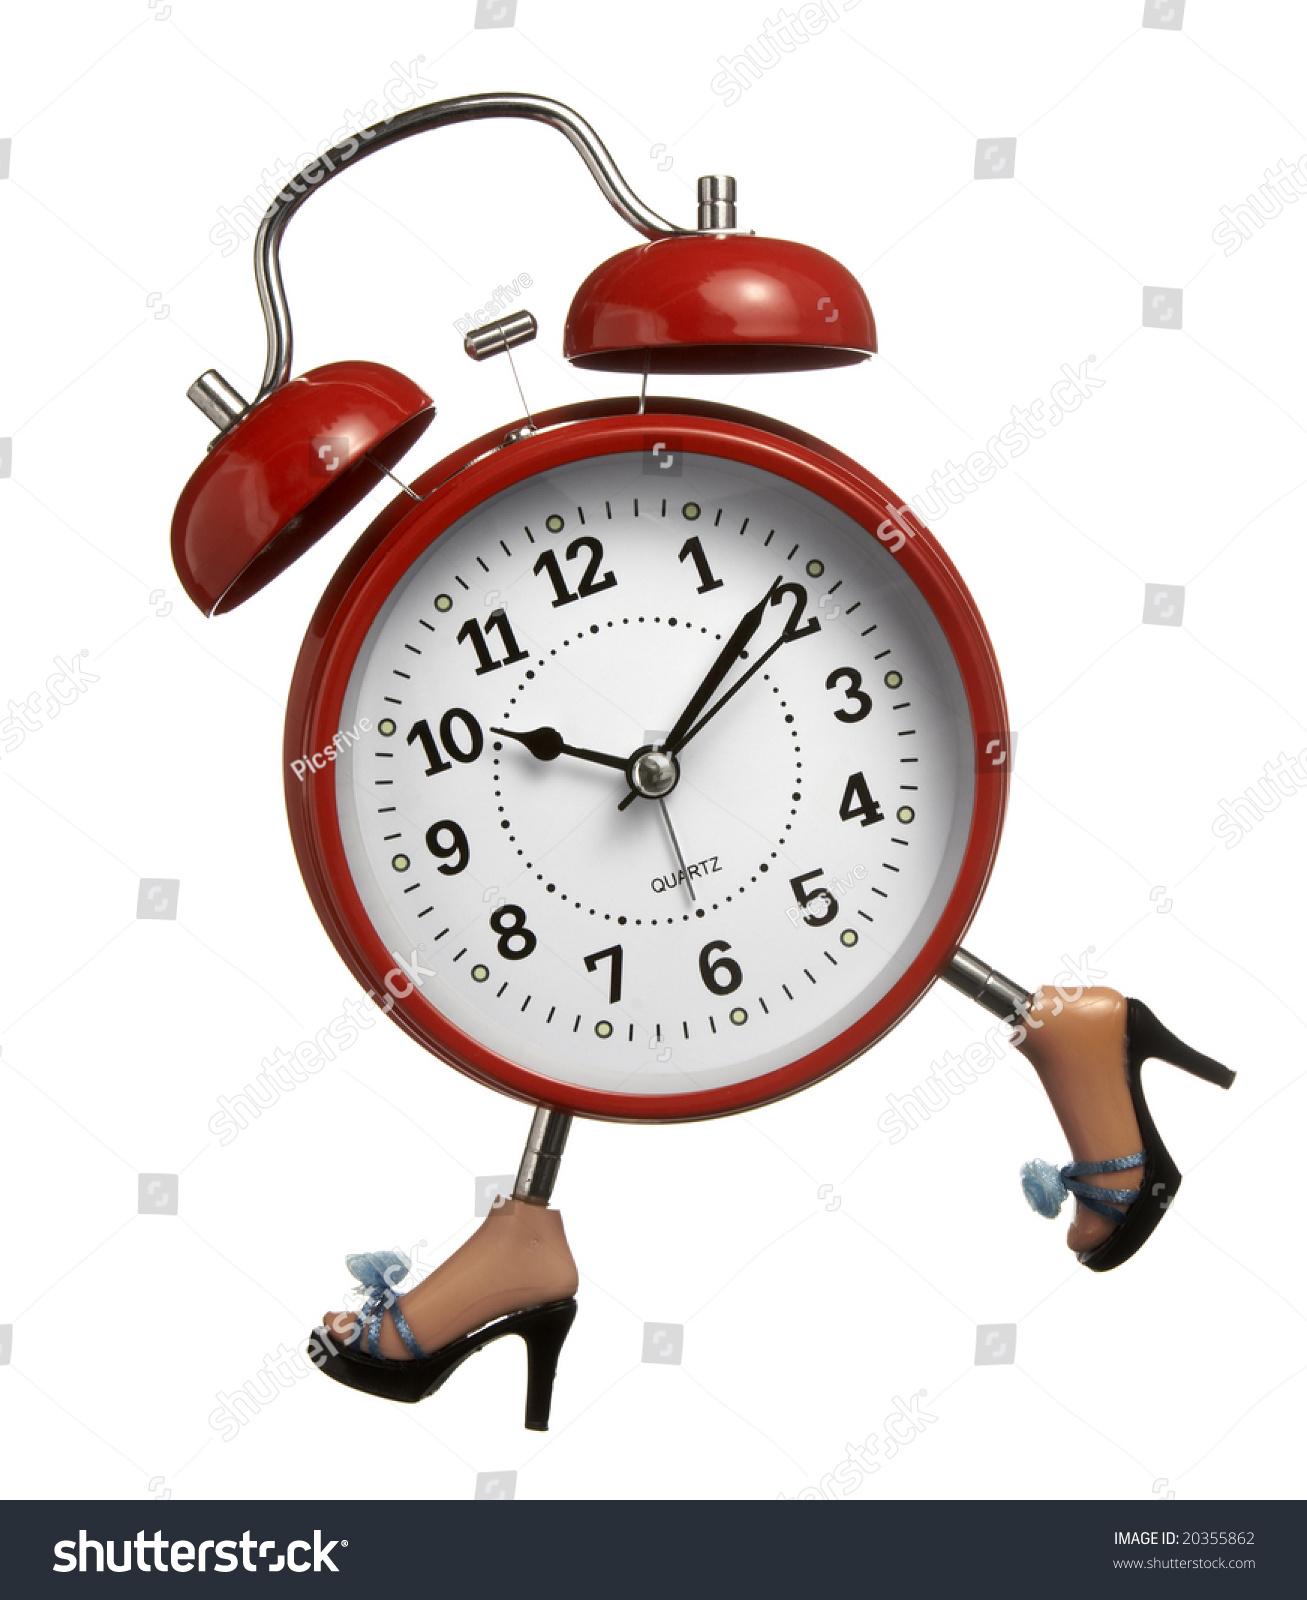 Close Red Clock Legs Running On Stock Photo 20355862 - Shutterstock